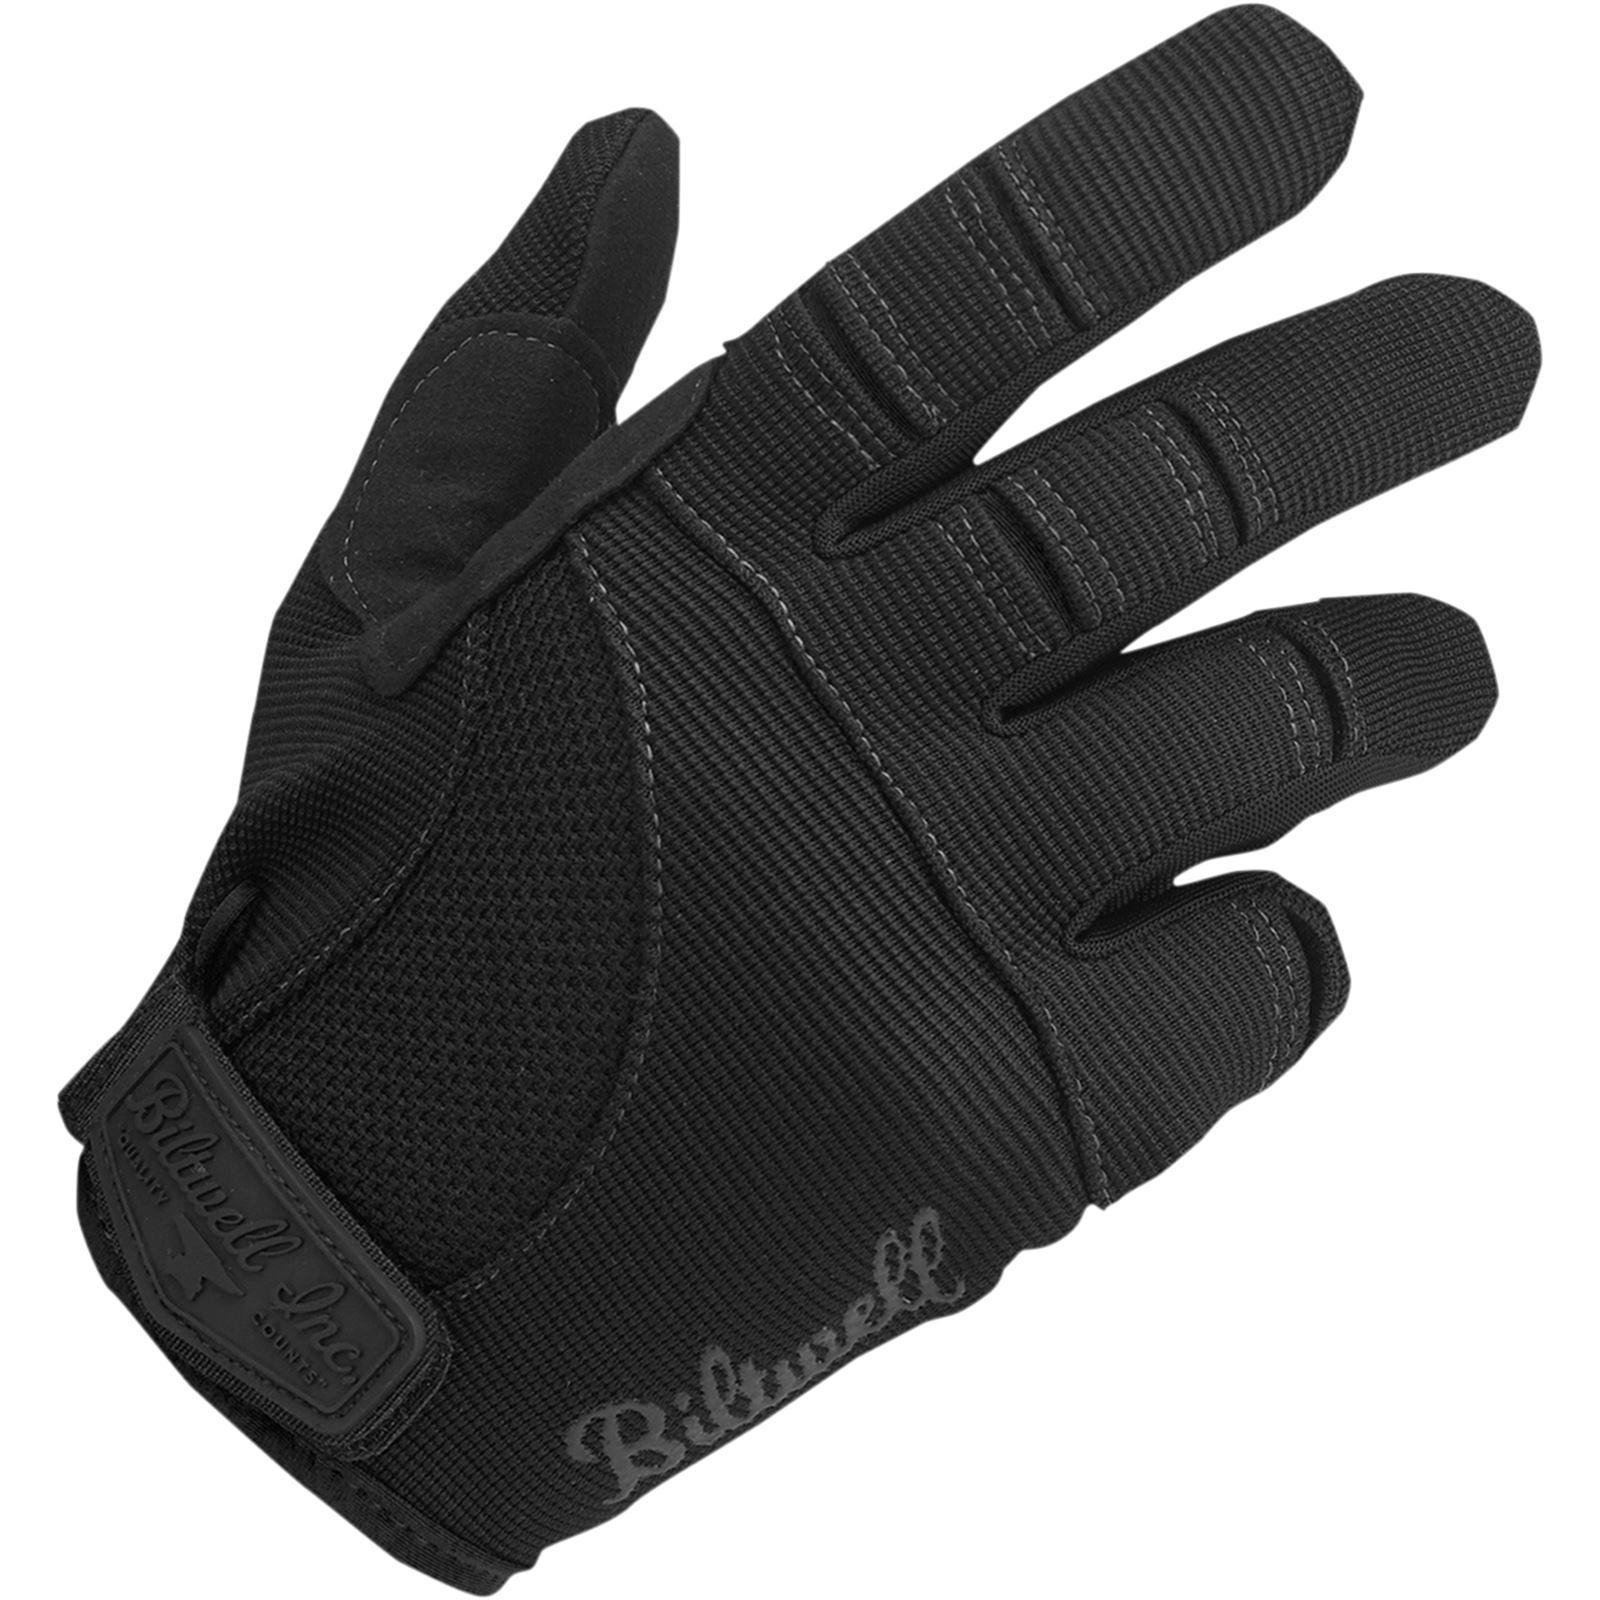 Biltwell Inc. Moto Gloves - Black - 2X-Large